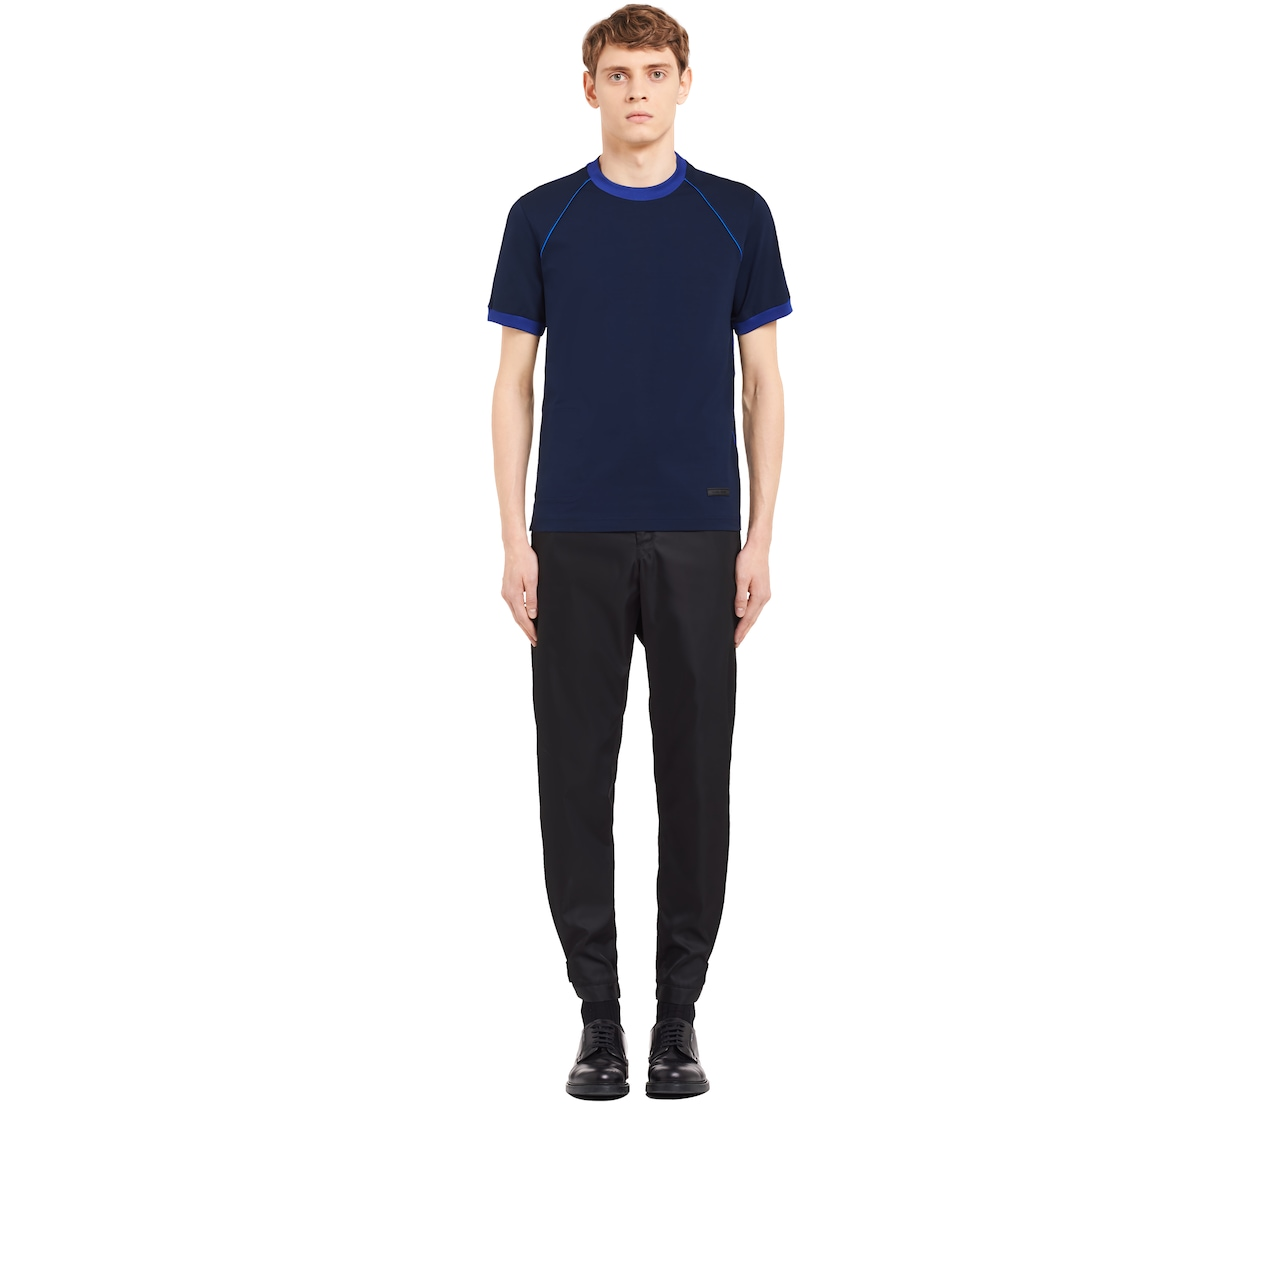 Prada 弹力棉质T恤 2